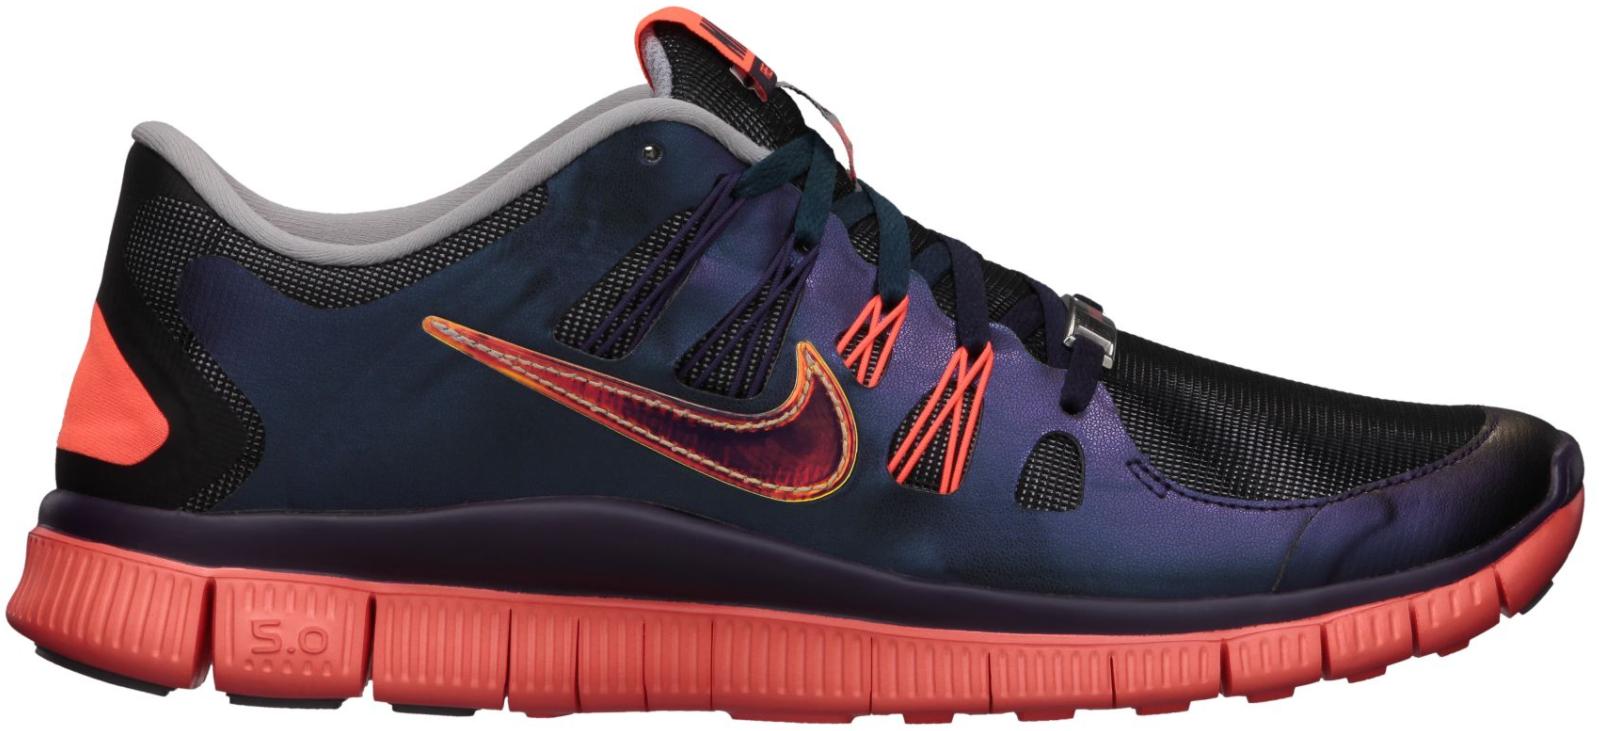 Nike Free 5.0 Doernbecher (2013